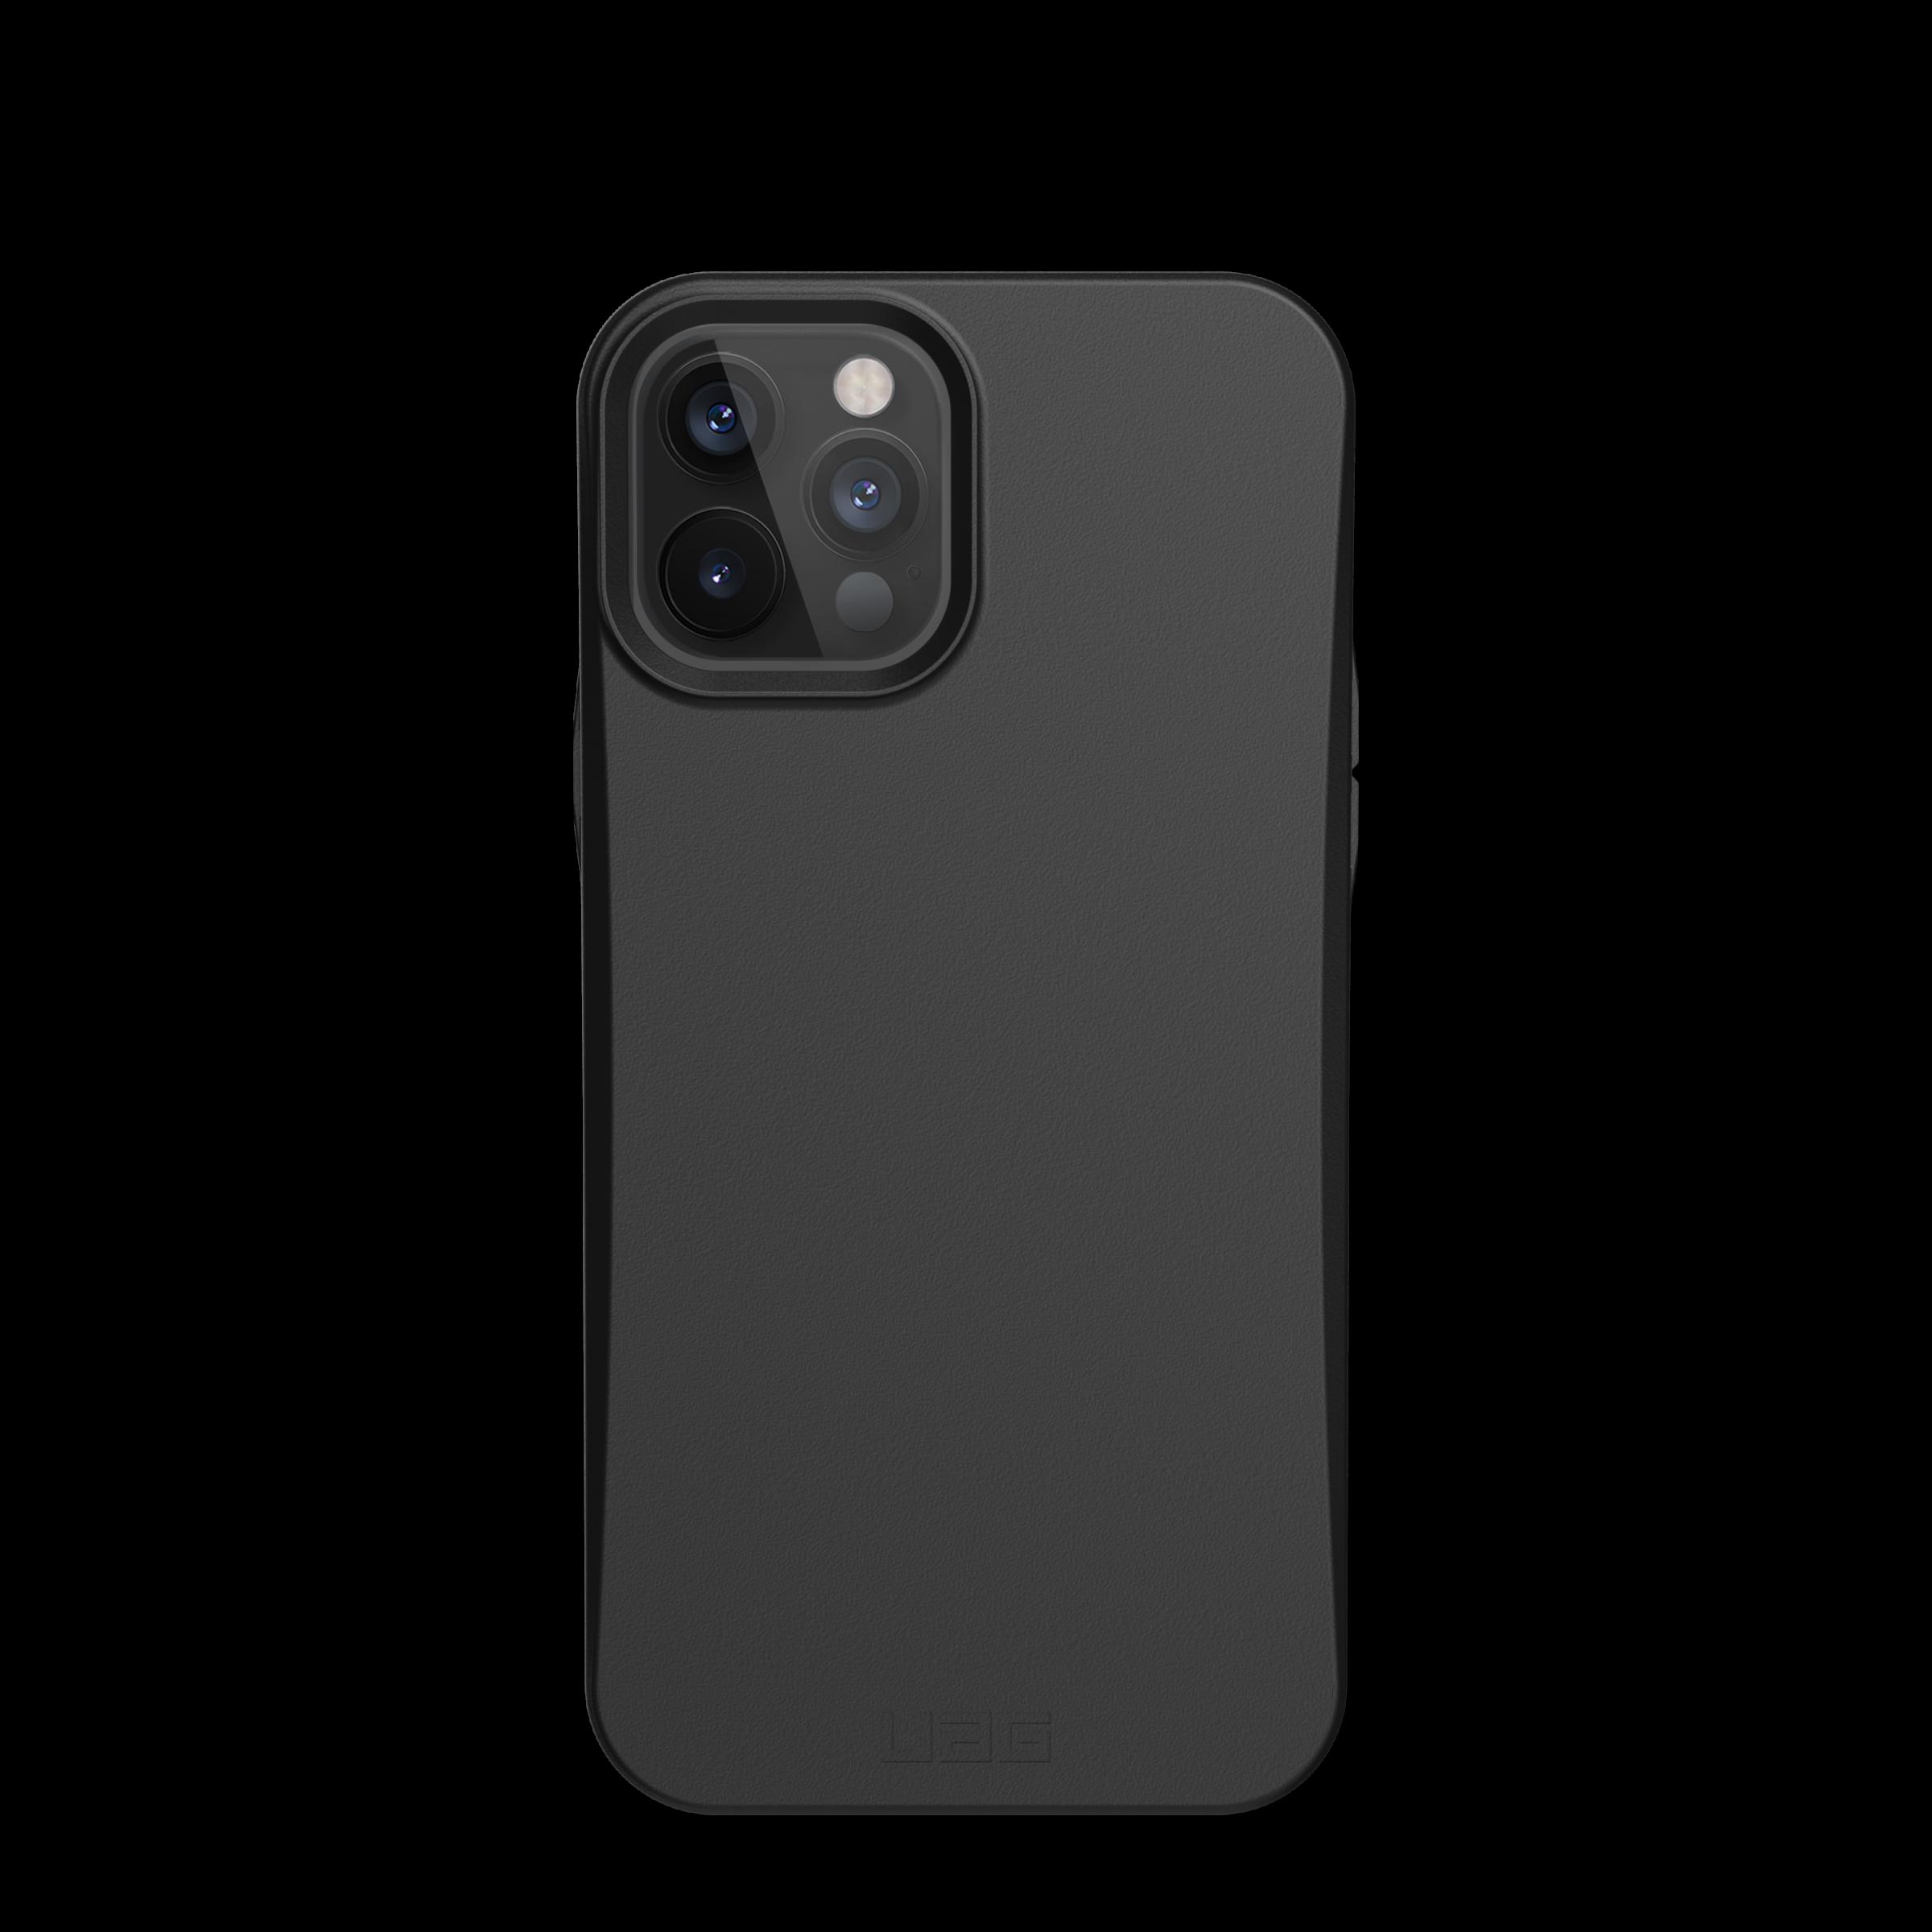 Outback Bio Case iPhone 12 Pro Max Black